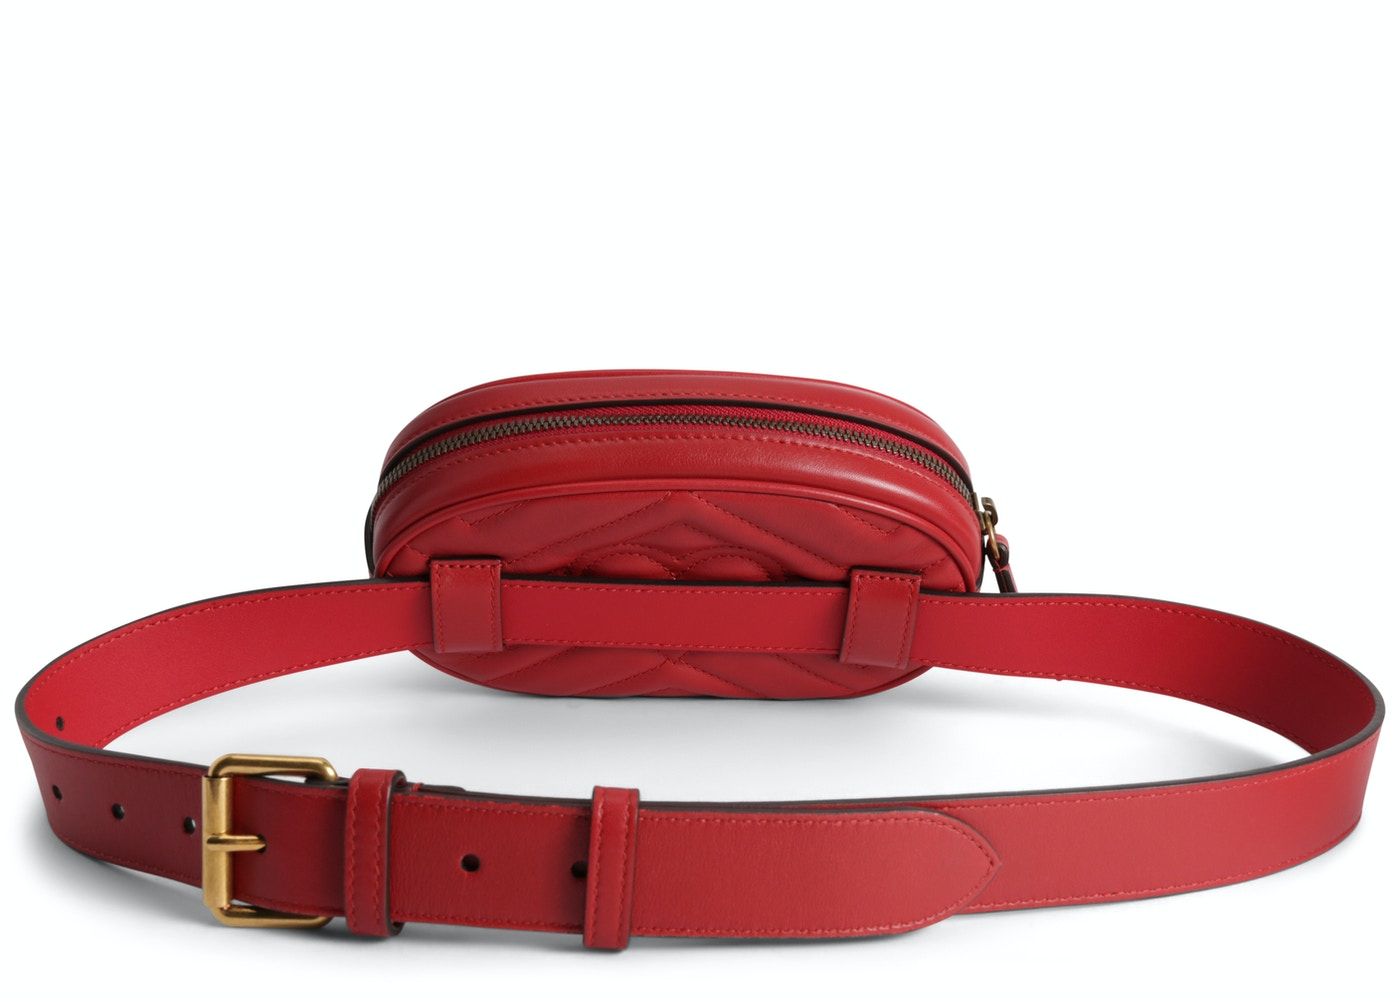 Gucci GG Marmont Belt Bag Matelasse Hibiscus Red